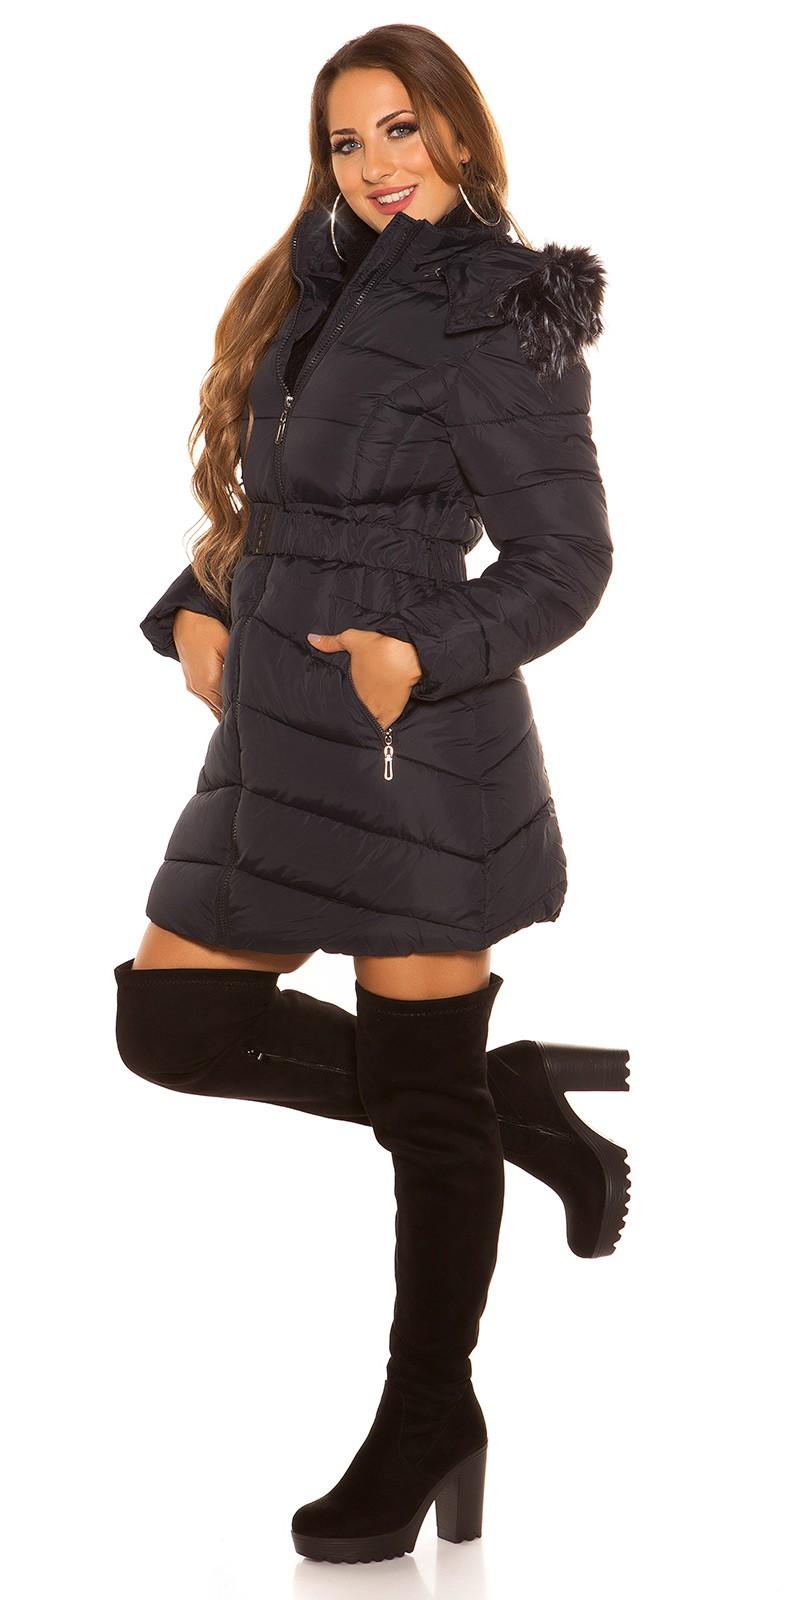 f9320917b uuquilted_coat_with_belt_fake_fur__Color_NAVY_Size_S_0000J1882_MARINE_25.  Tmavomodra dlha zimna damska bunda